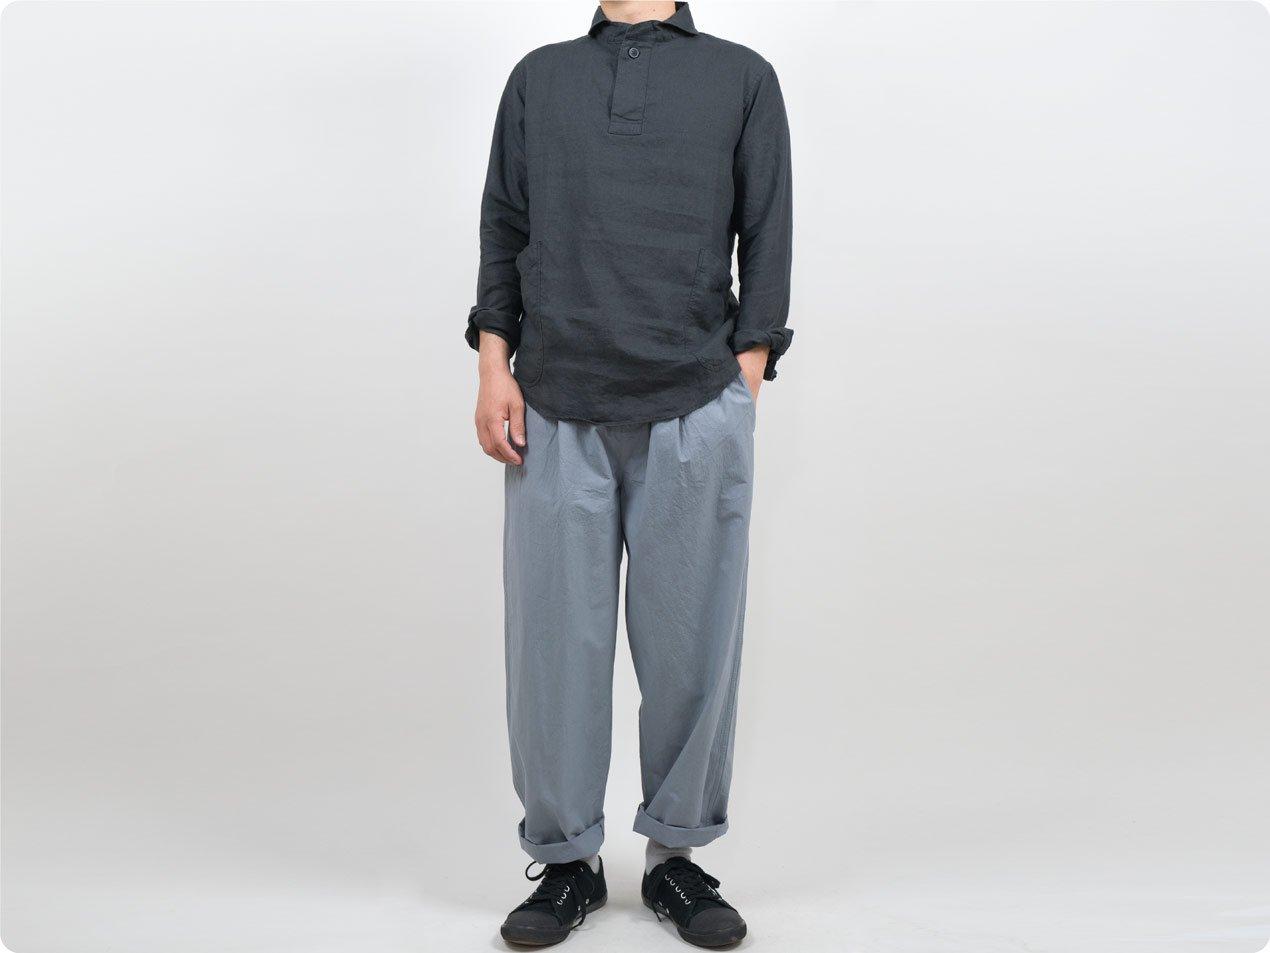 maillot mature rub cotton easy pants LIGHT GRAY